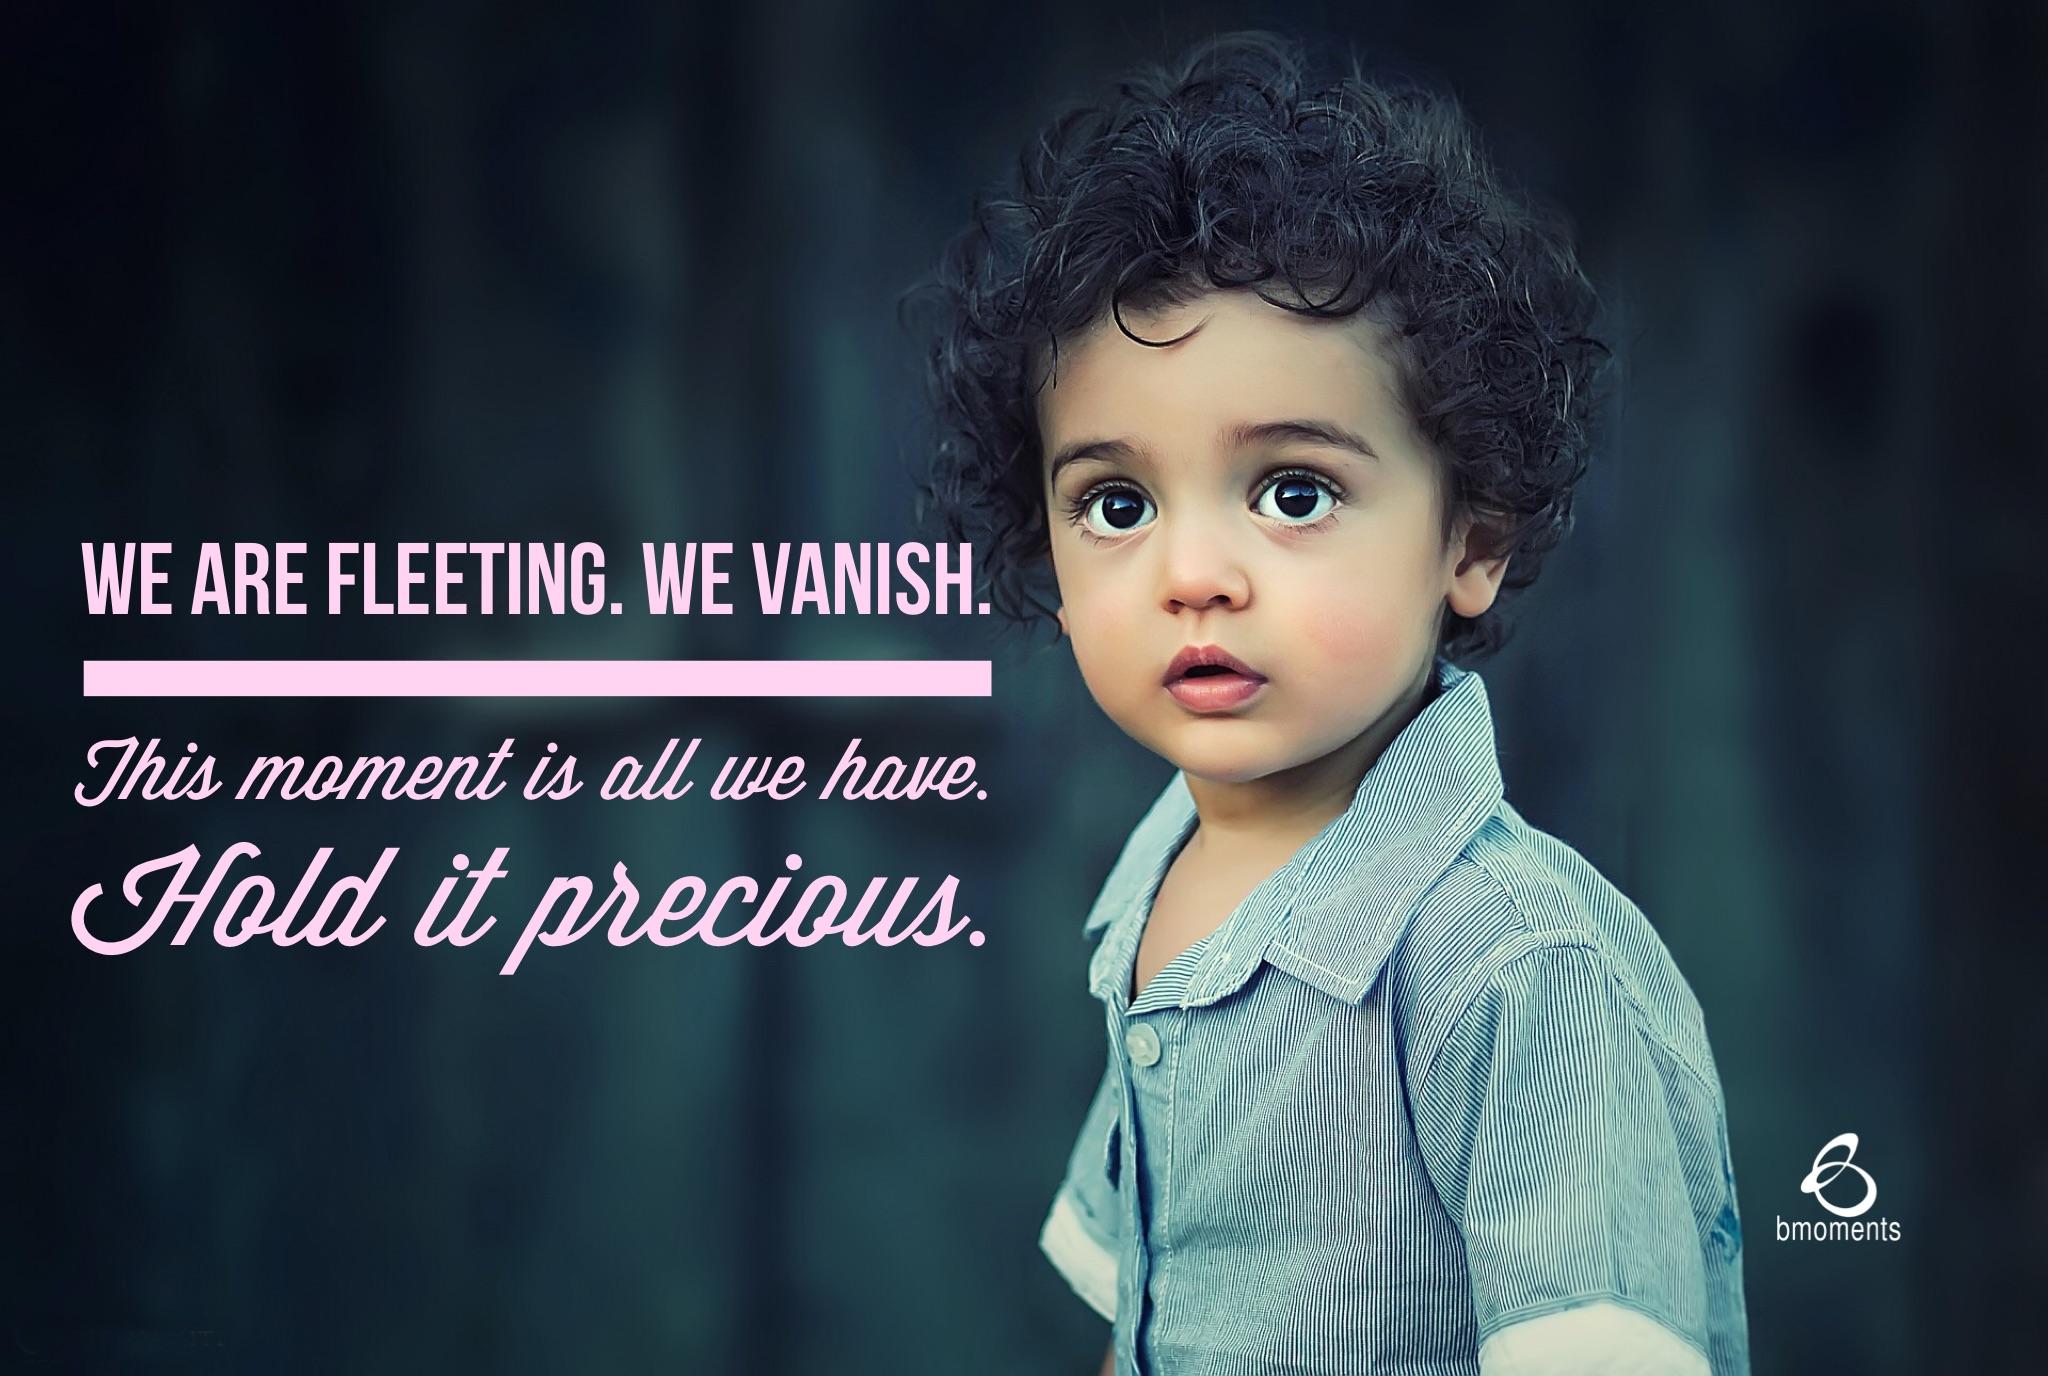 B Moment, each moment is precious